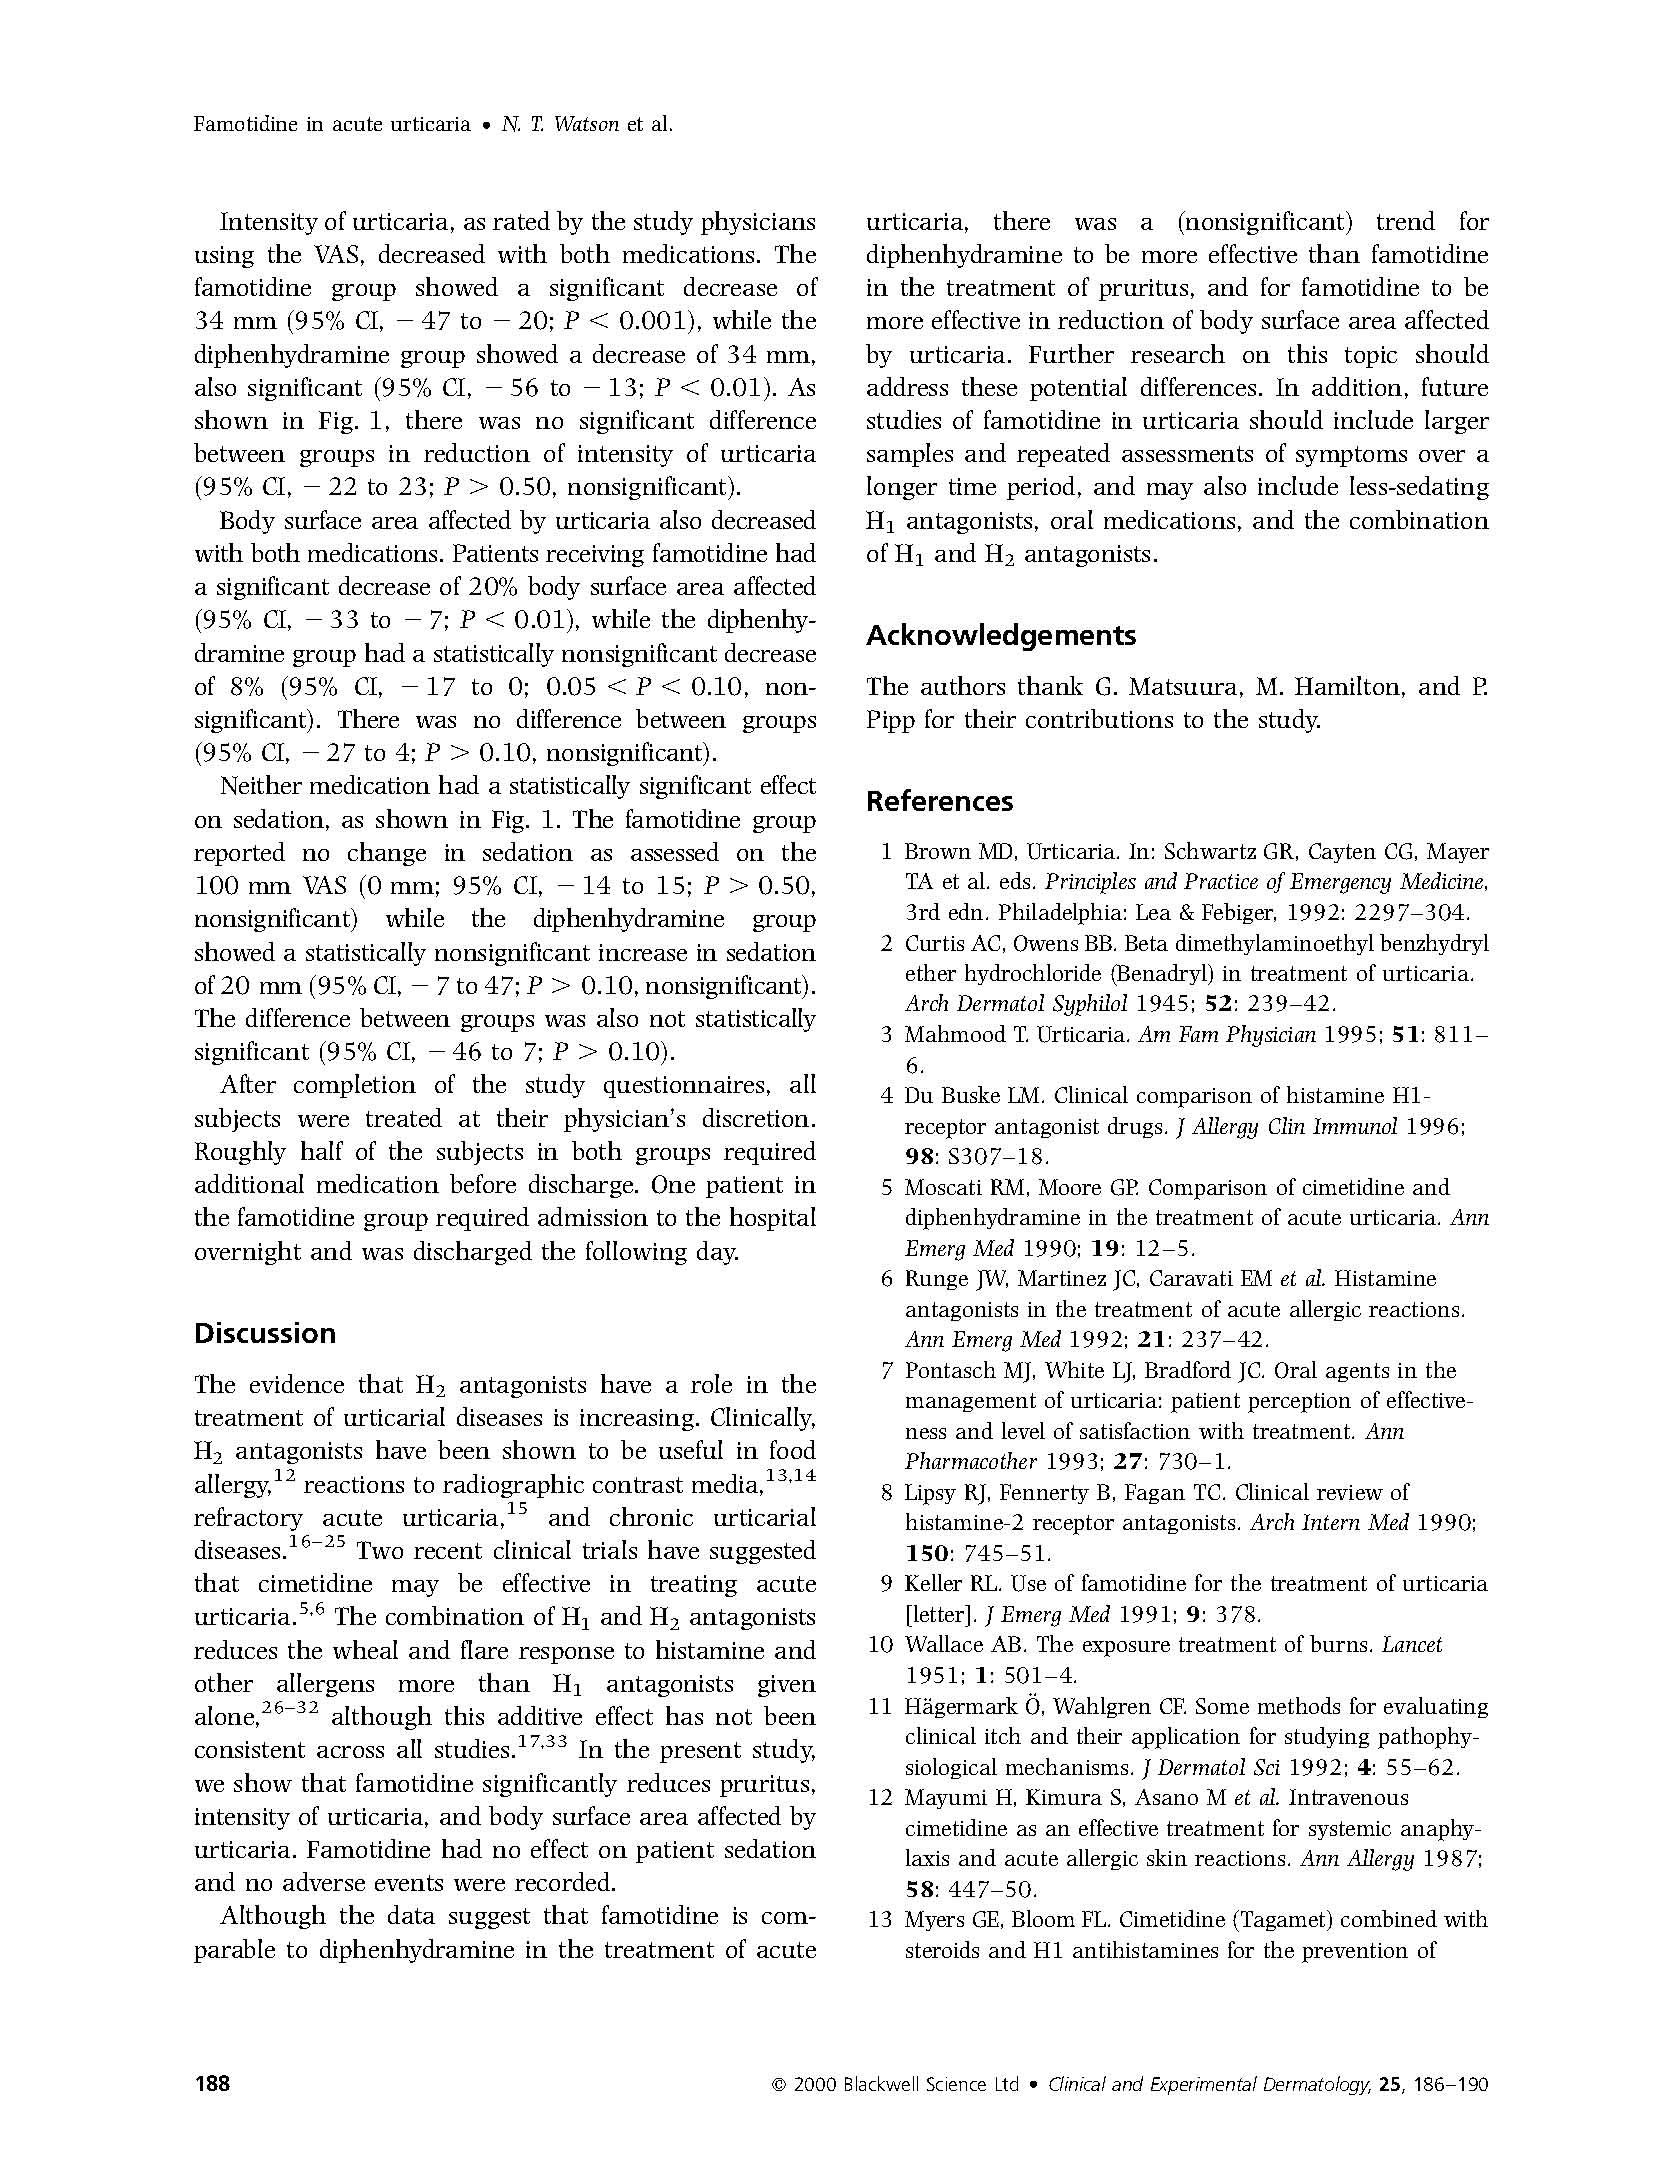 Famotidine in the treatment of acute urticaria_頁面_3.jpg